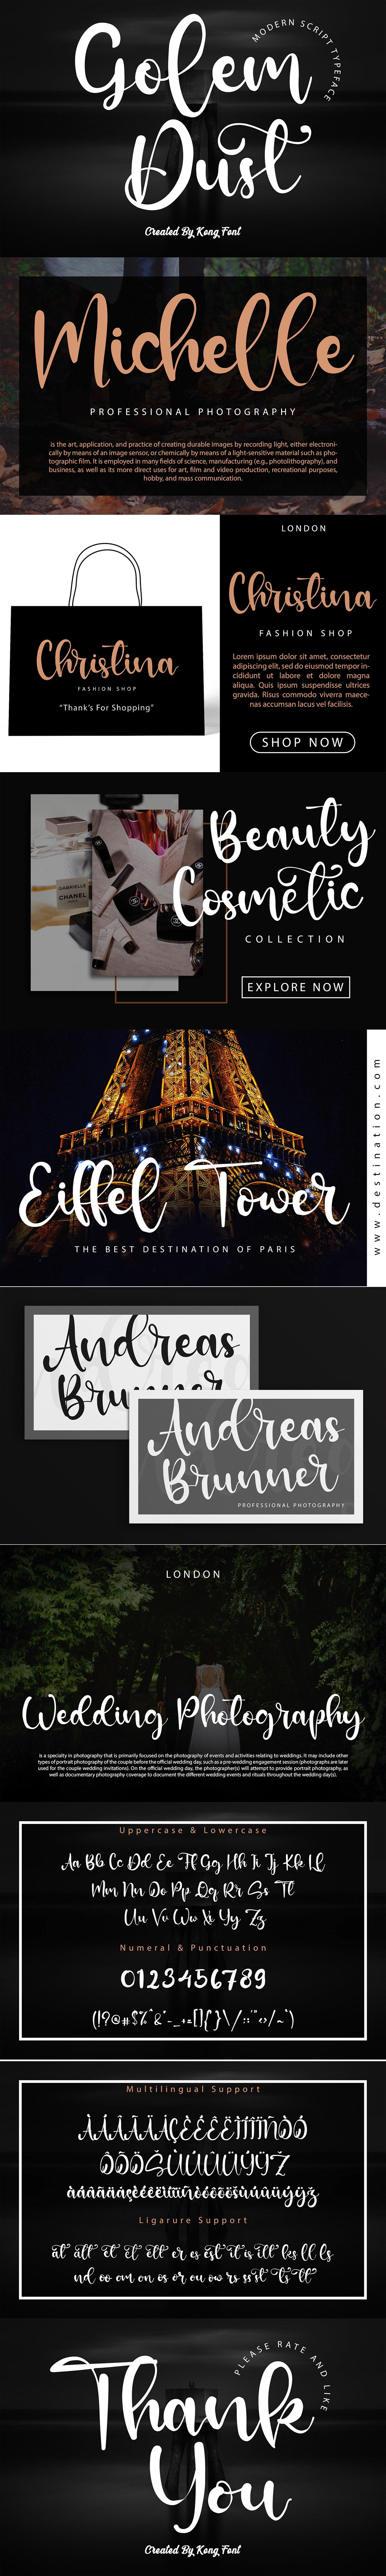 branding  designfont font golem dust greeting card lettering Logotype modern Script Typeface